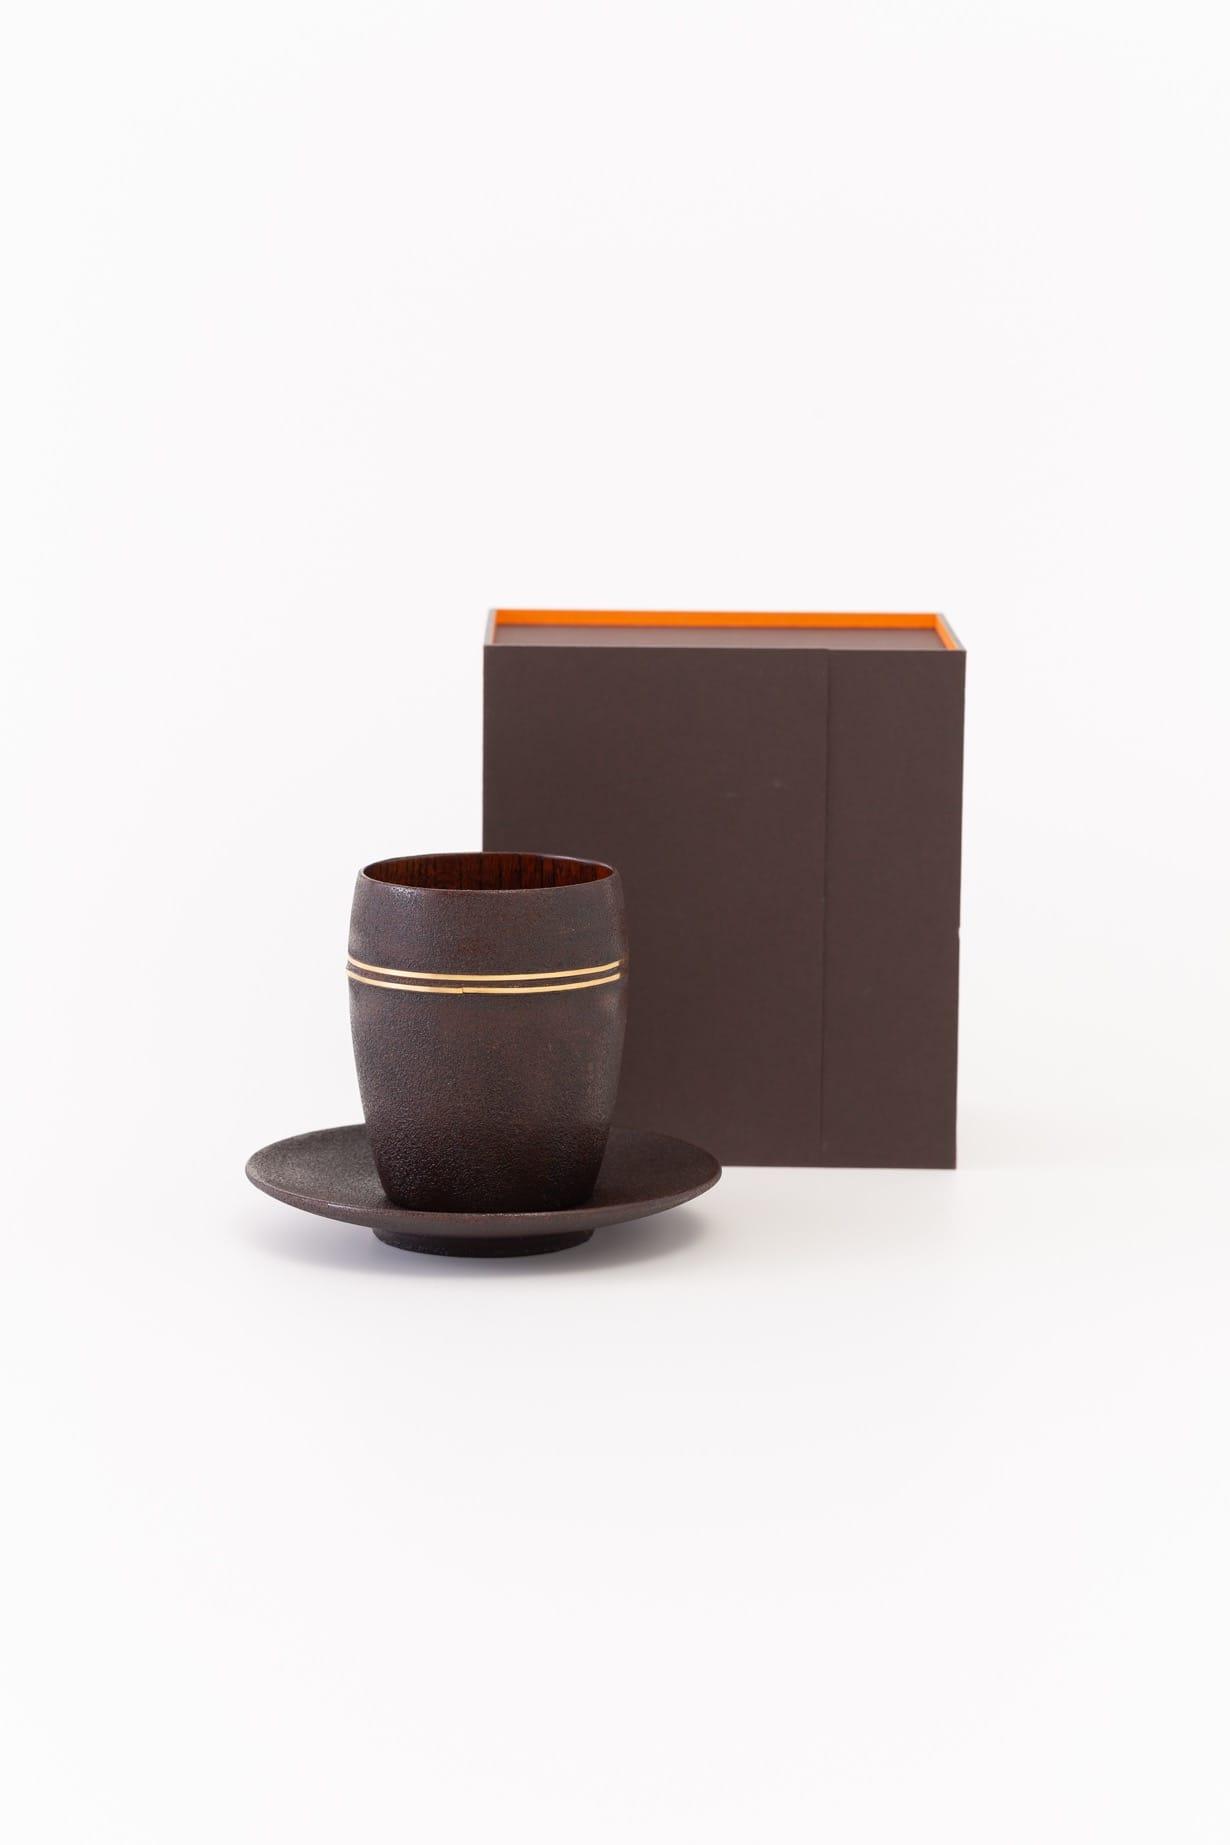 素椀(茶)箱付き